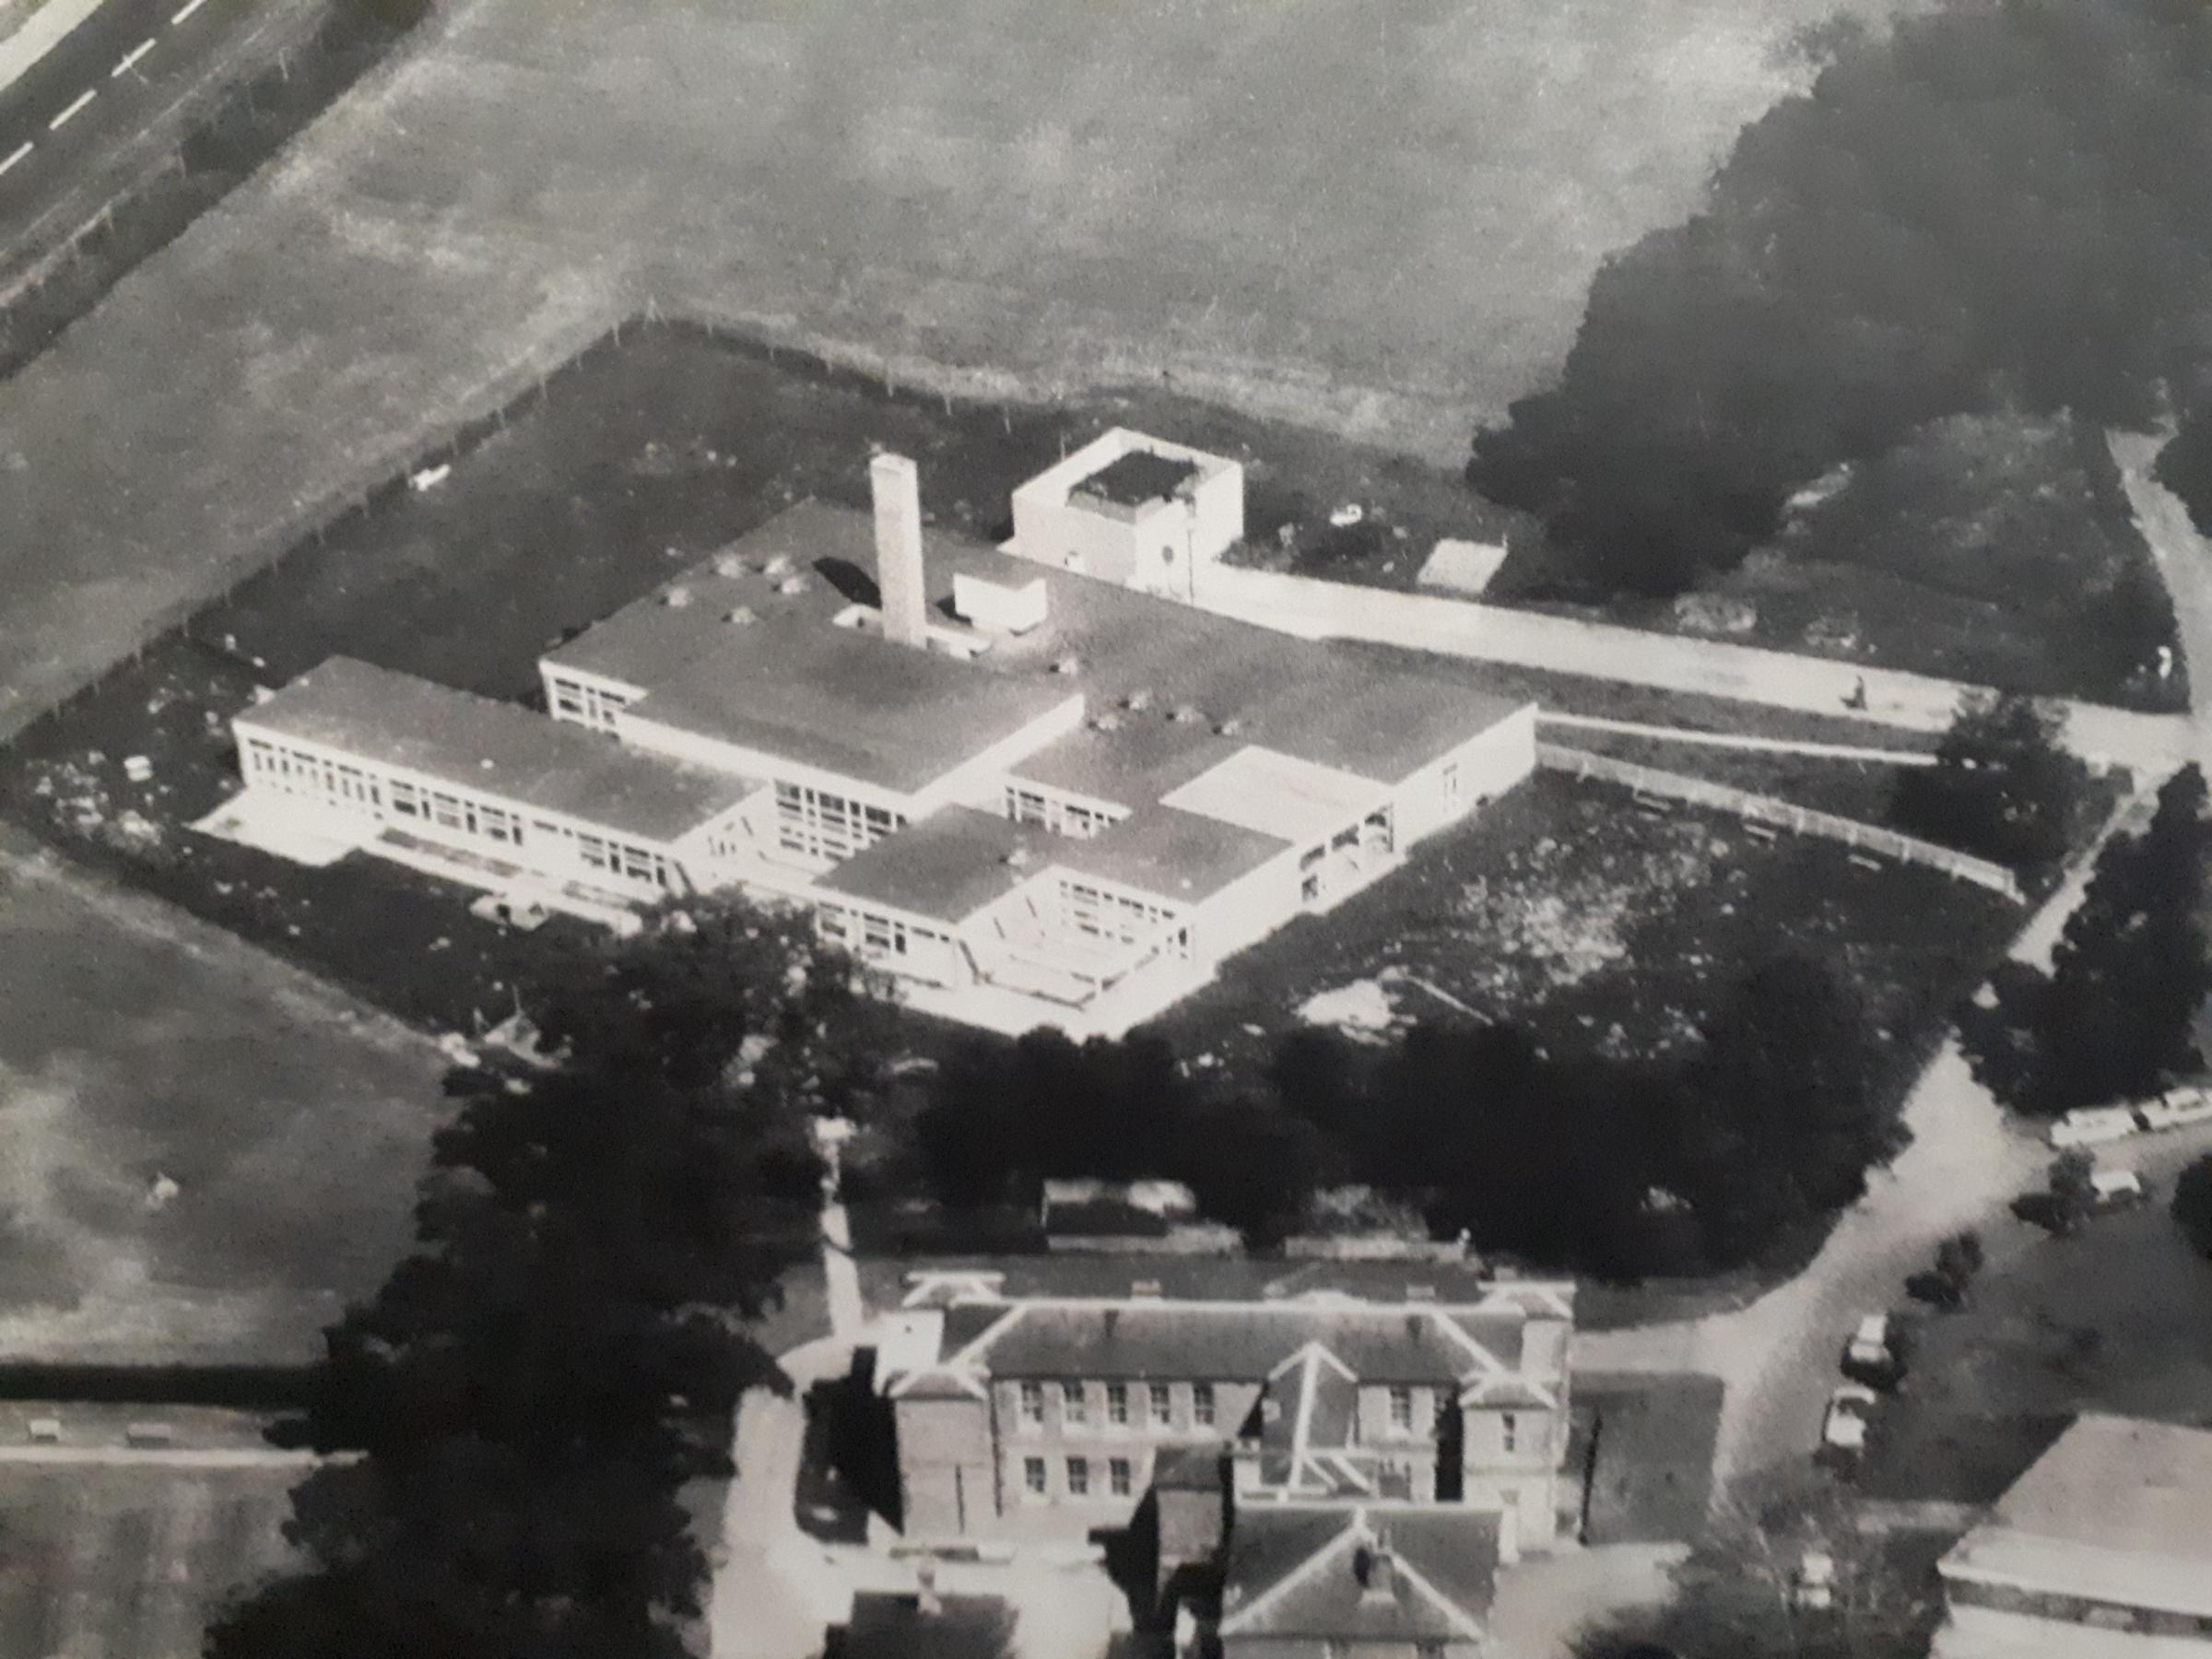 Springfield School in 1968. Photo: Leavesden Hospital History Association